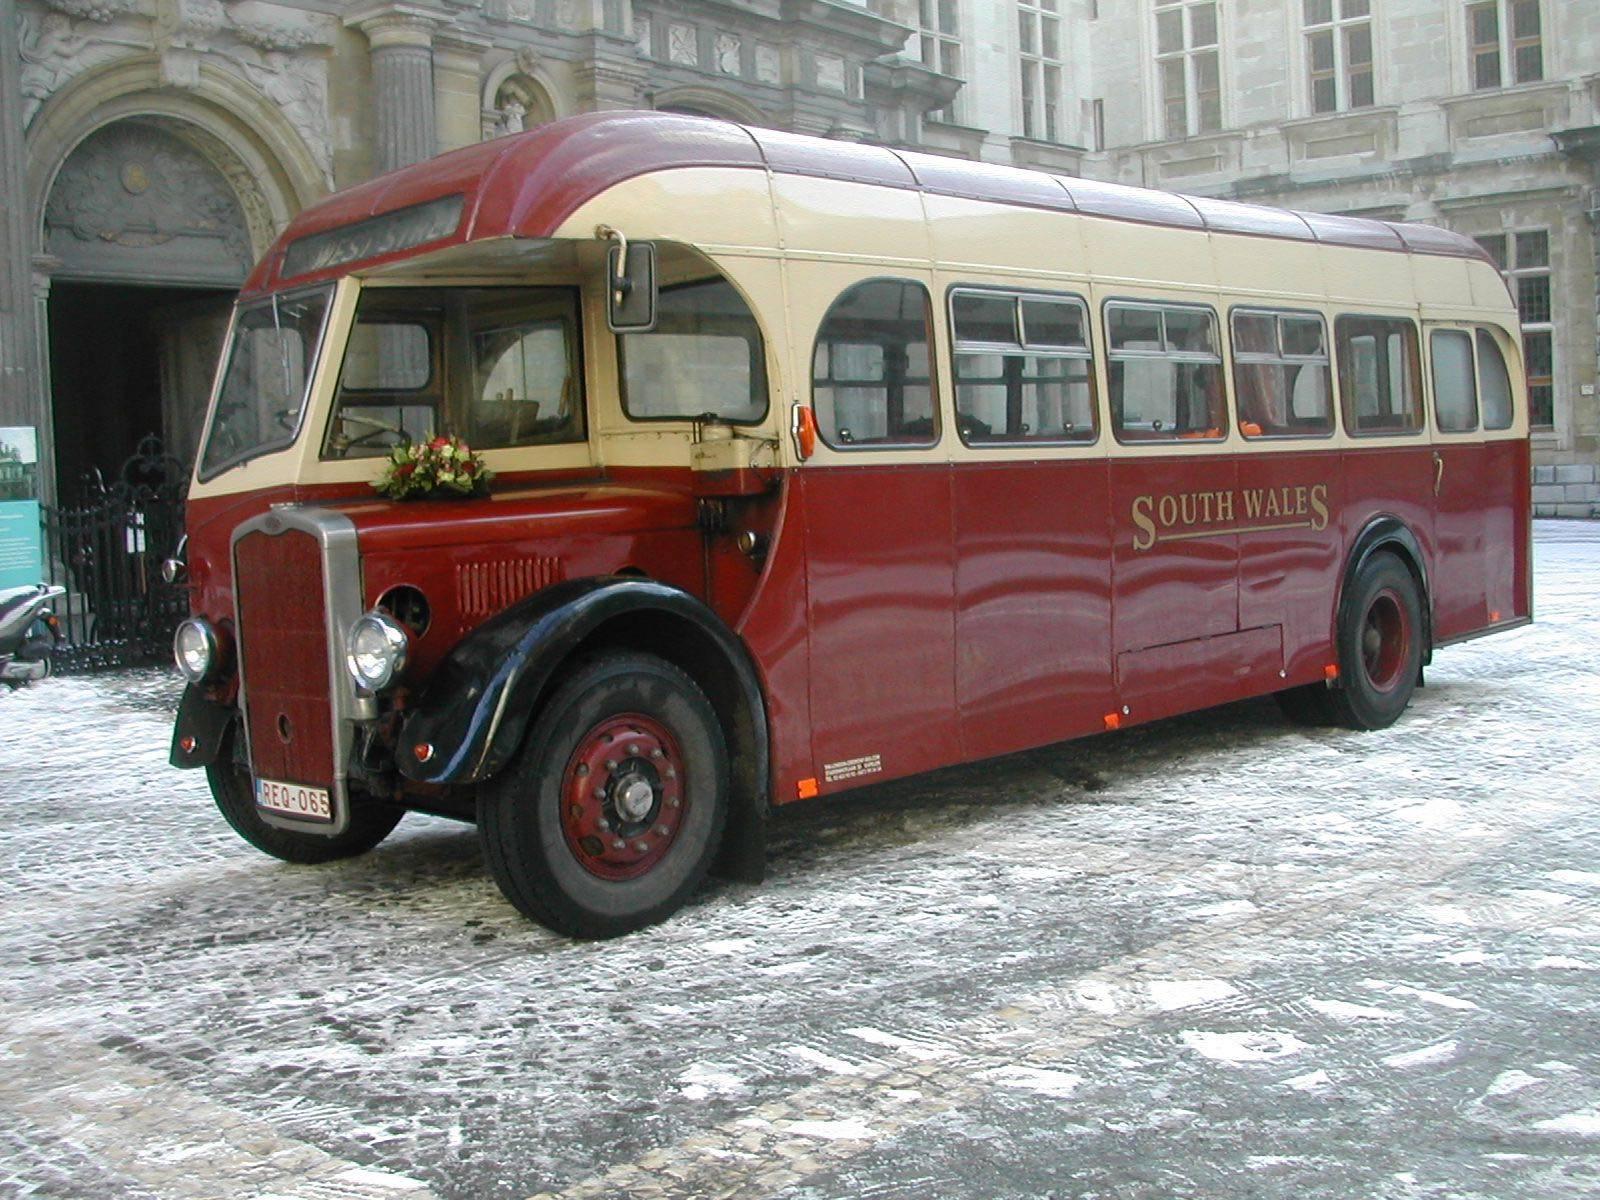 The London Ceremony Bus - Trouwvervoer - Ceremonievervoer - Bus - House of Weddings - 16